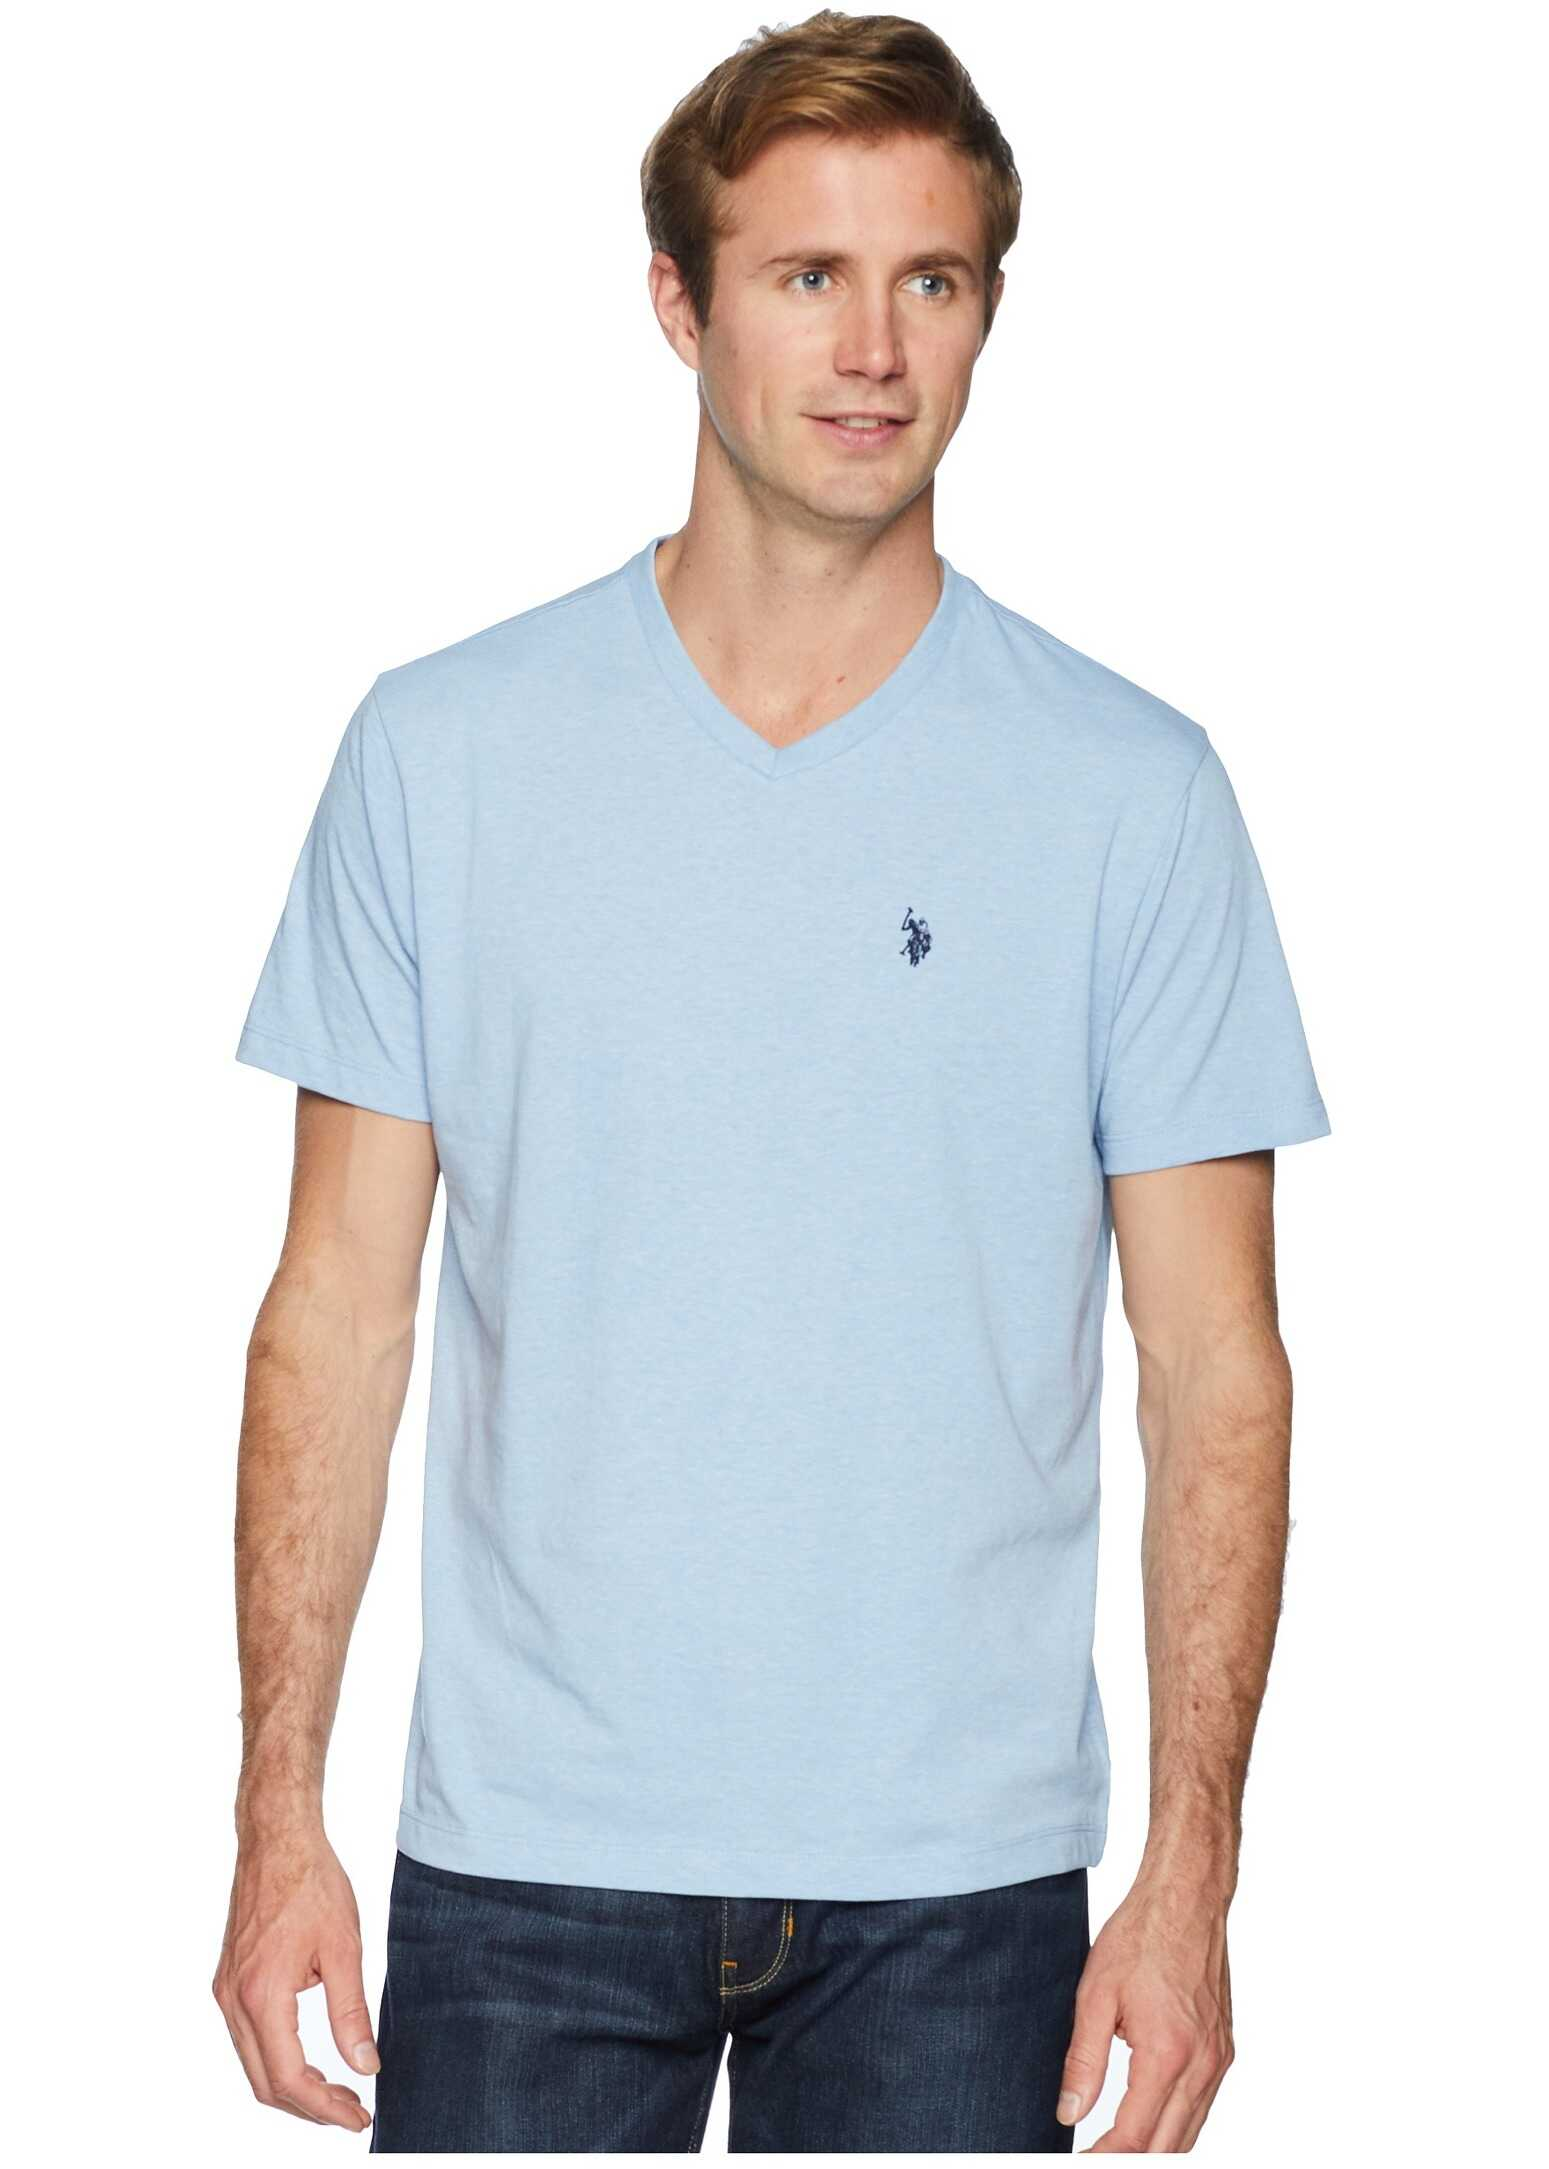 Short Sleeve Solid V-Neck T-Shirt